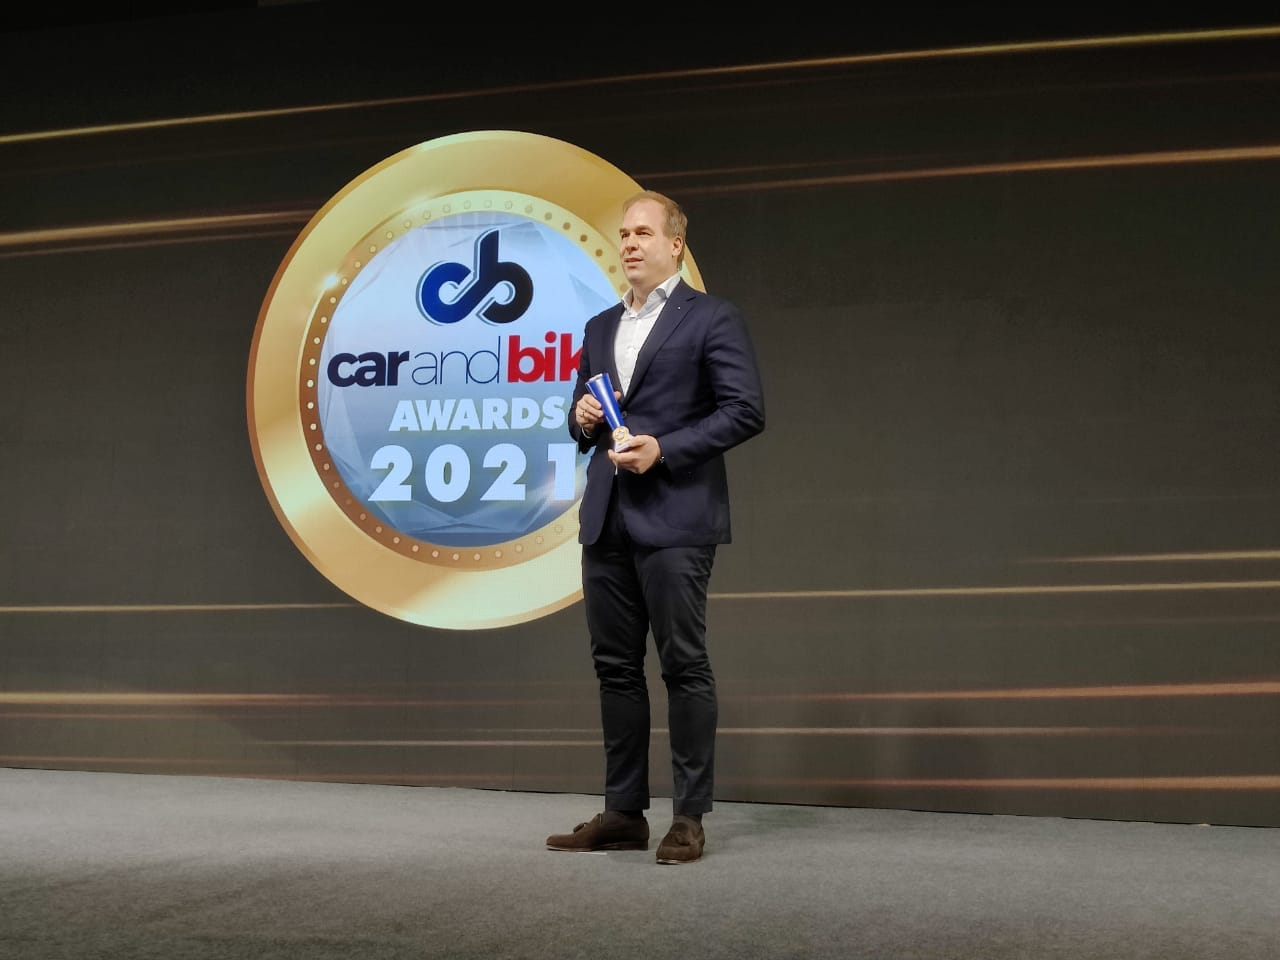 carandbike Awards 2021: BMW M8 Wins Performance Car Of The Year